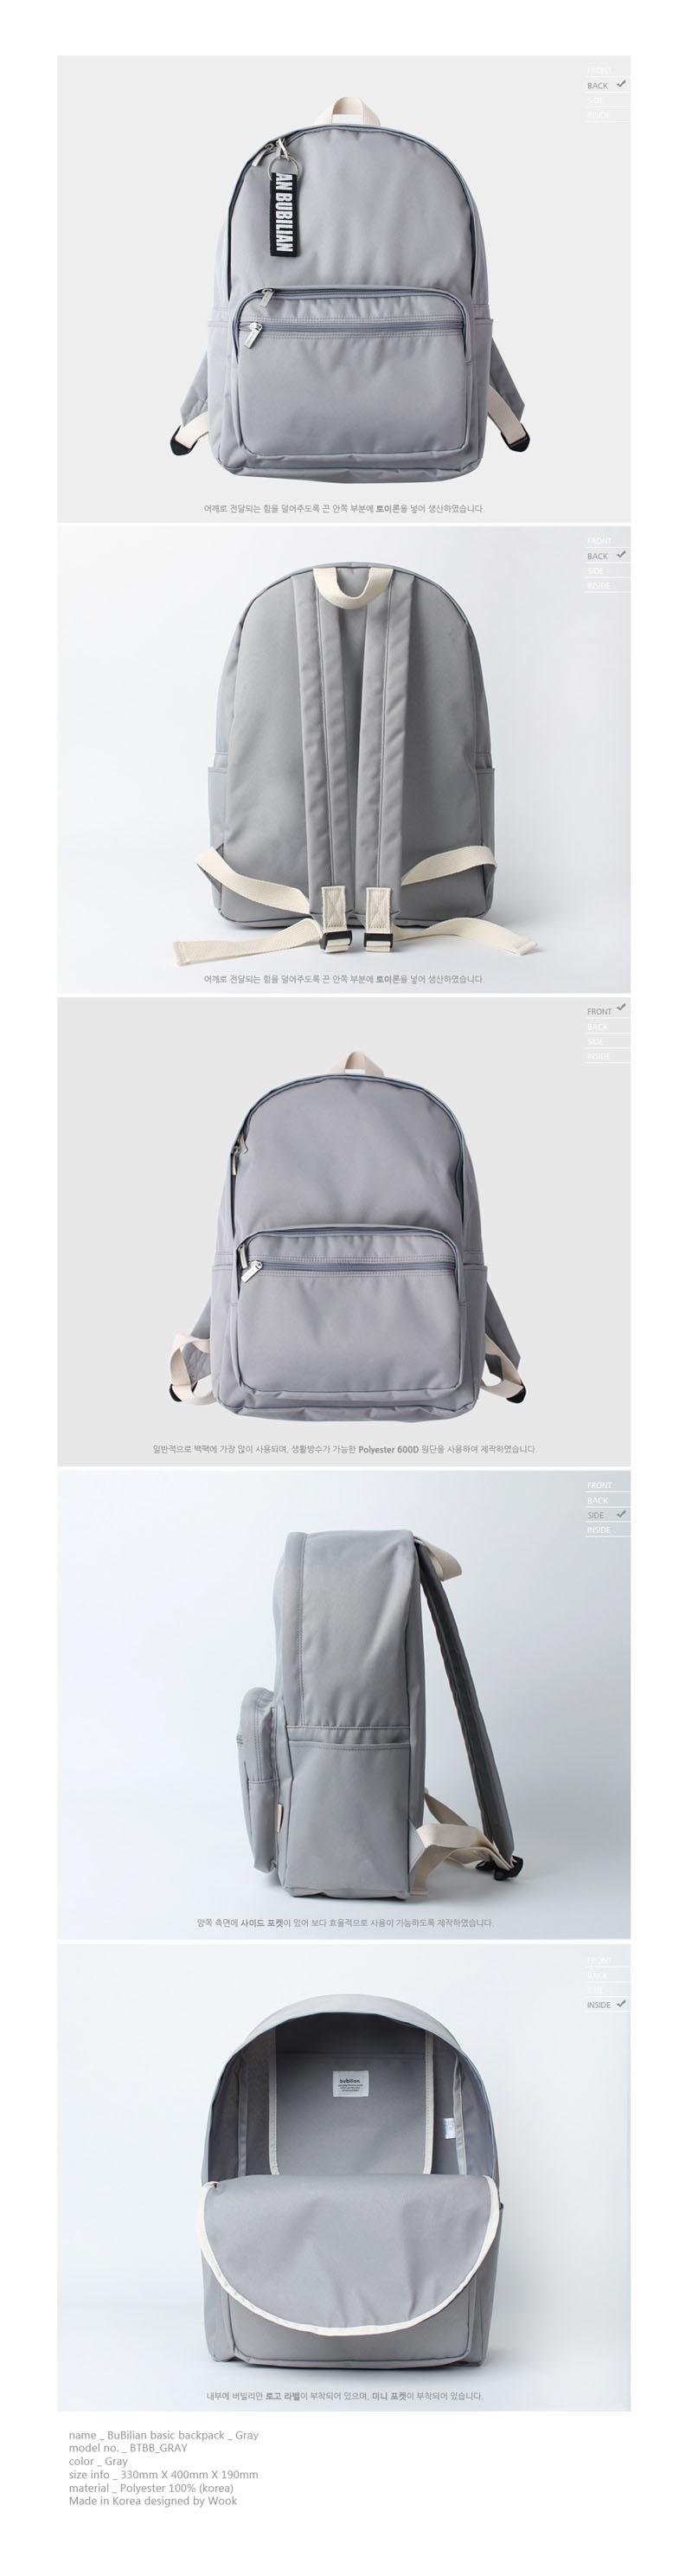 Buy New Arrival Korea Hot Selling Muji Style Backpack